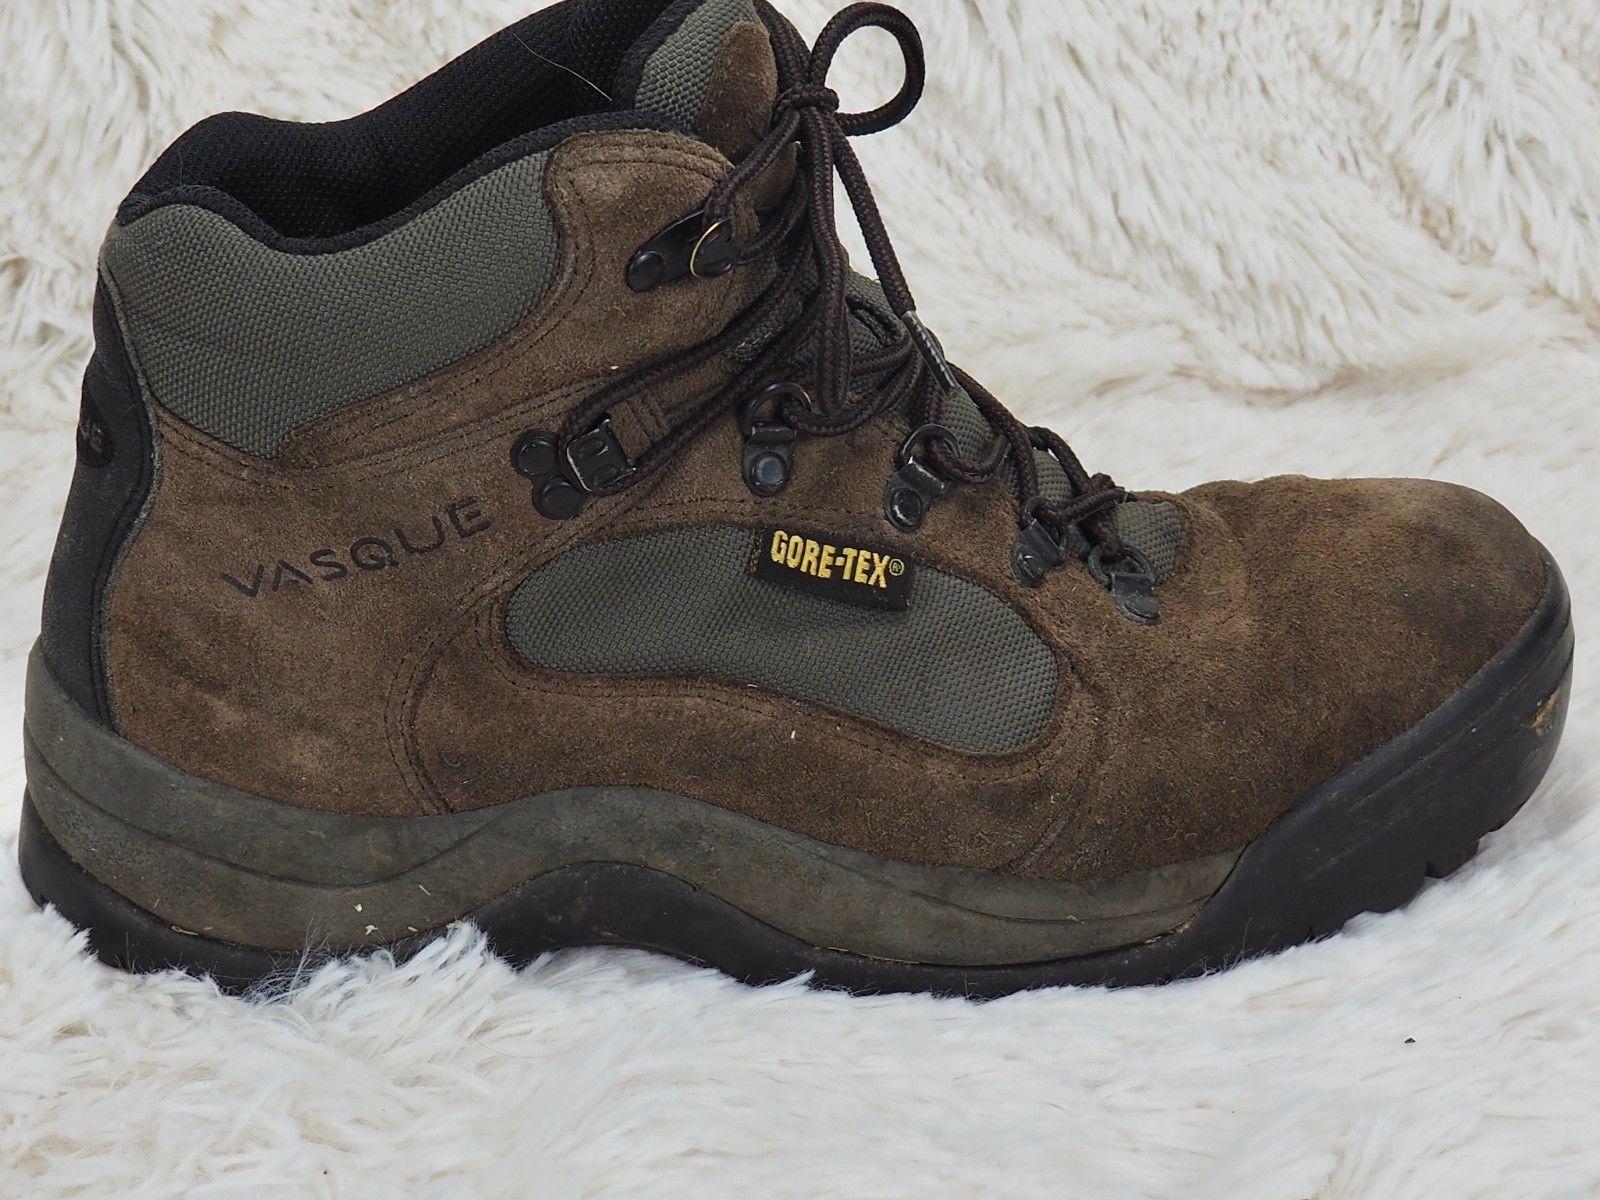 fce24971560 Vasque Ranger GTX Gore Tex Boots 7210 Brown and 38 similar items